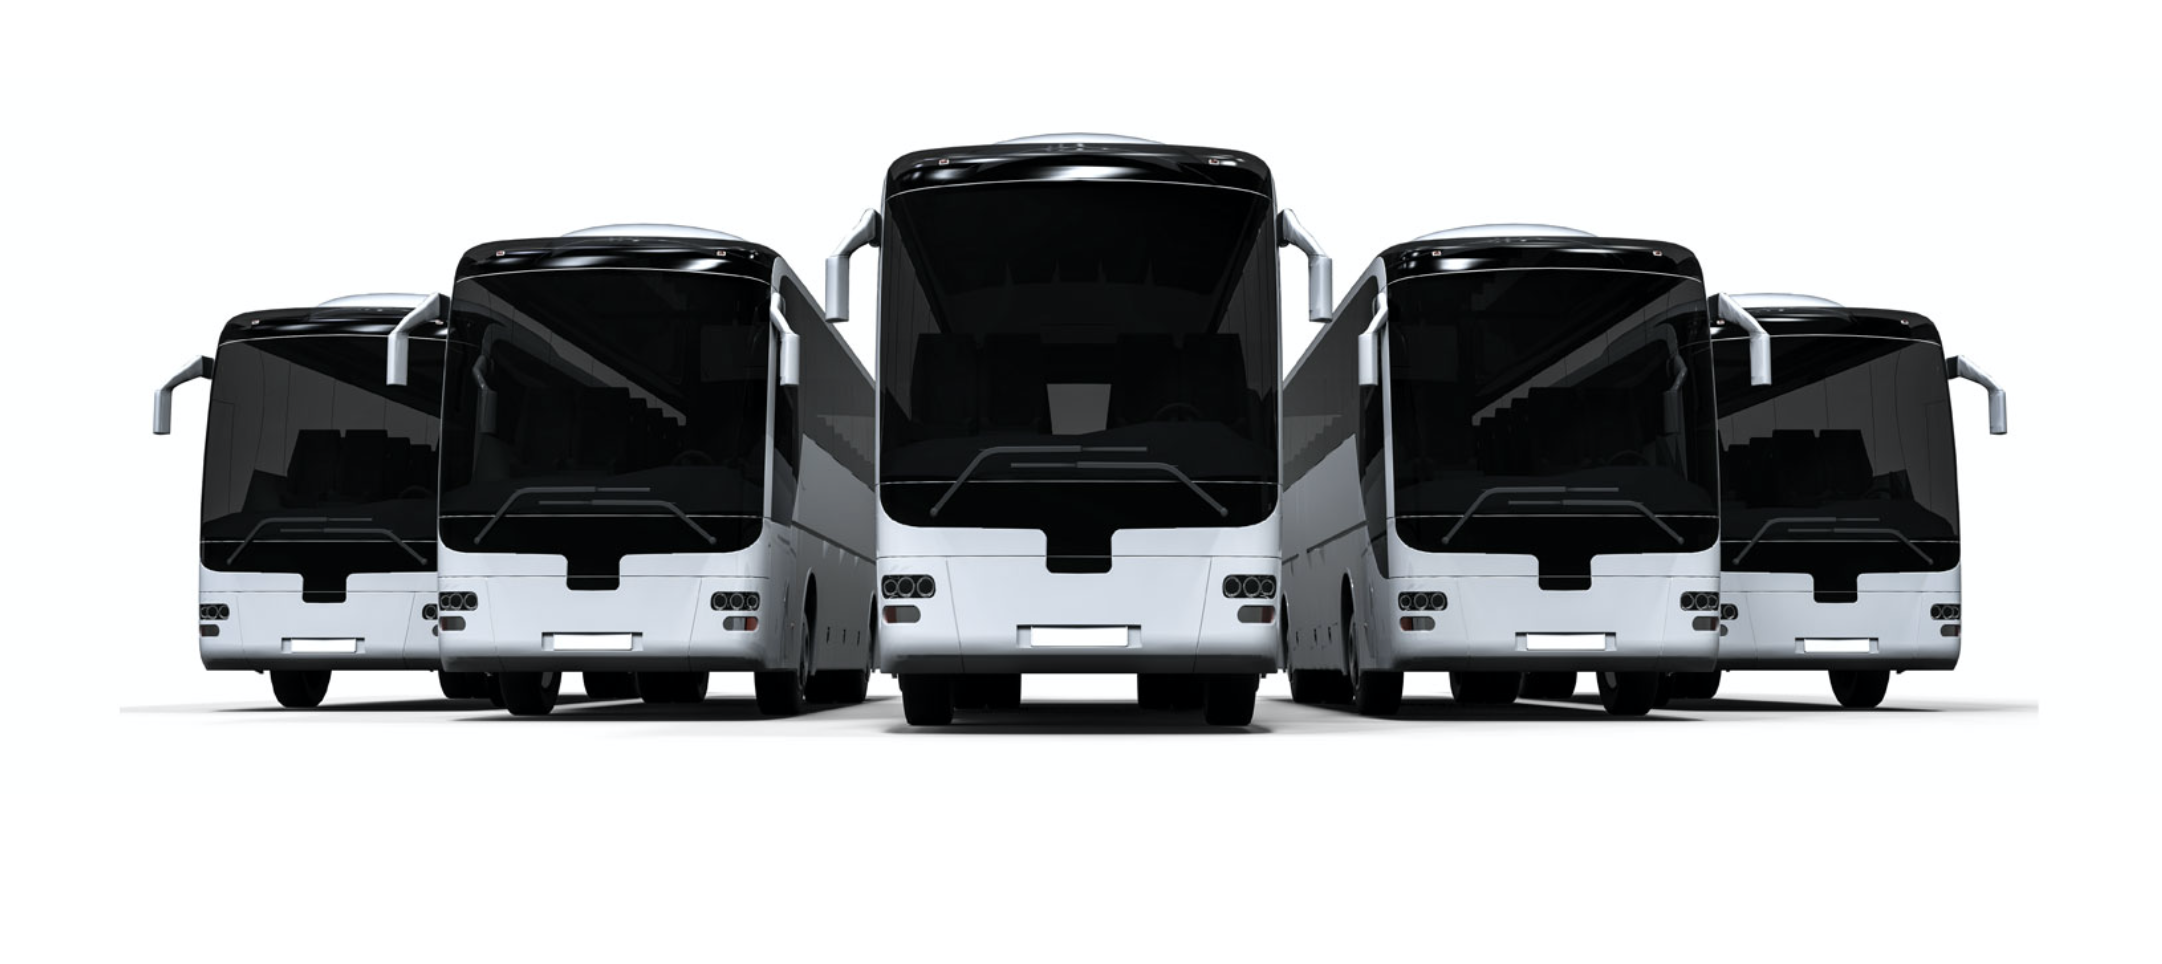 aecom amply power bus electrification